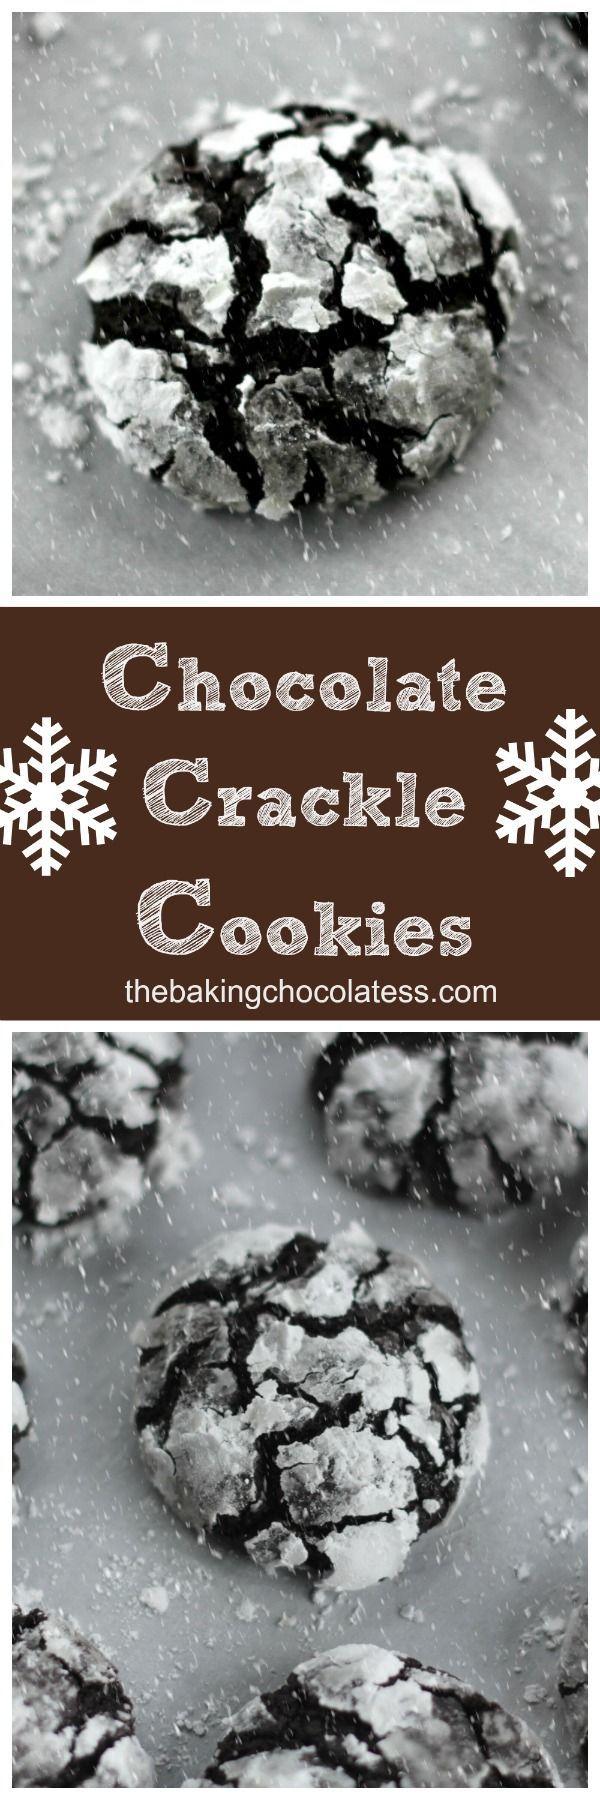 Christmas Chocolate Crackle Cookies via /https/://www.pinterest.com/BaknChocolaTess/